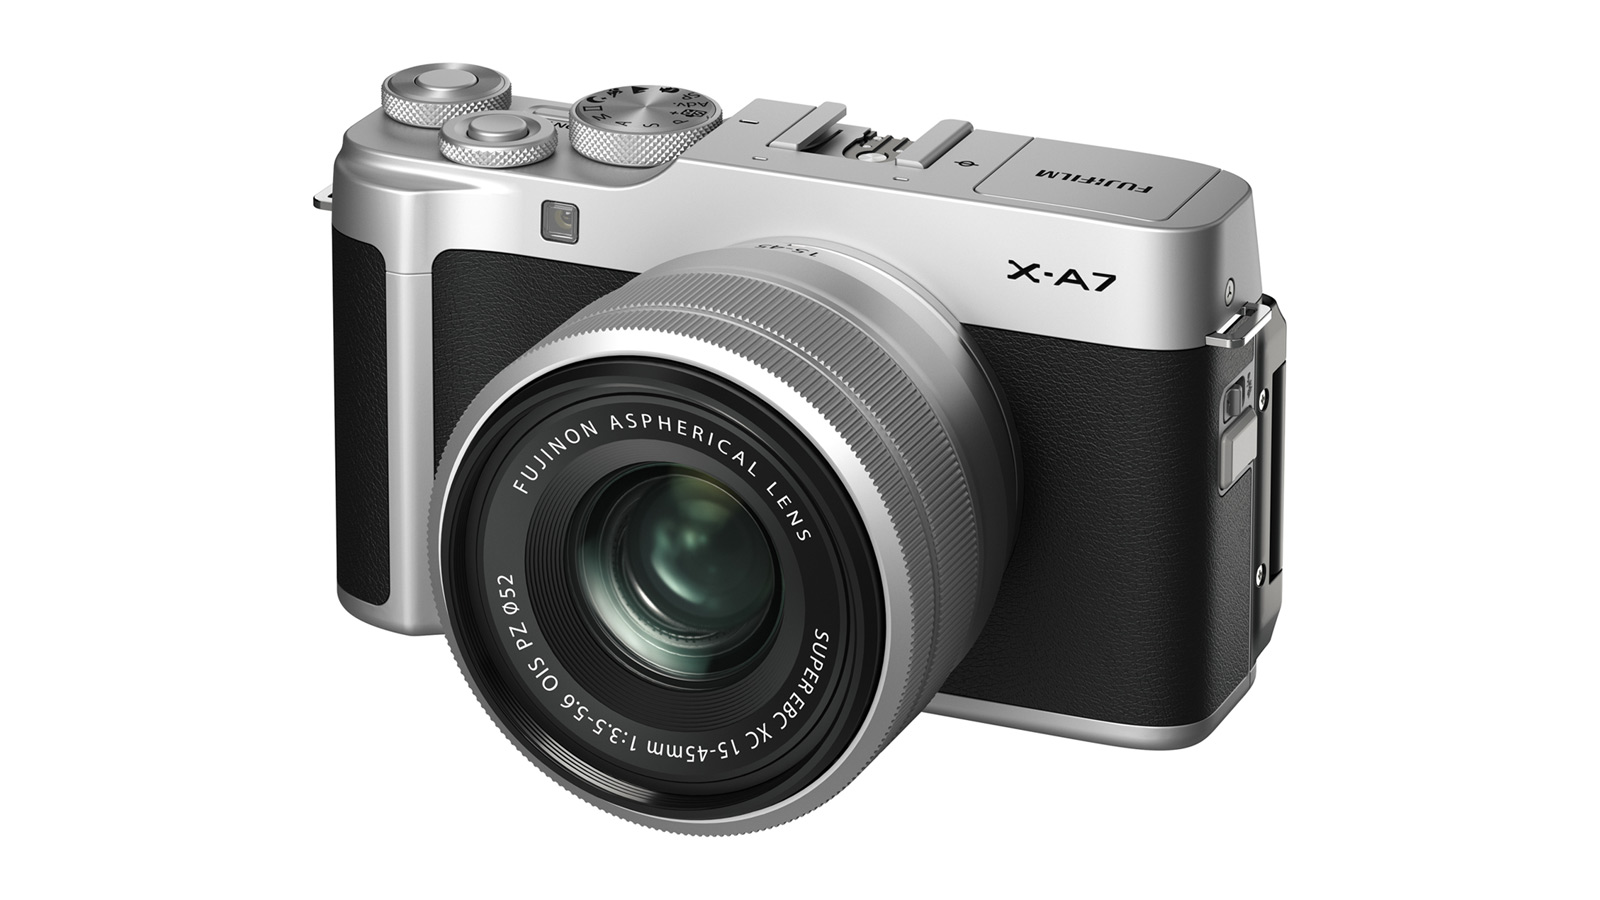 Fujifilm's New X-A7 Coming Soon